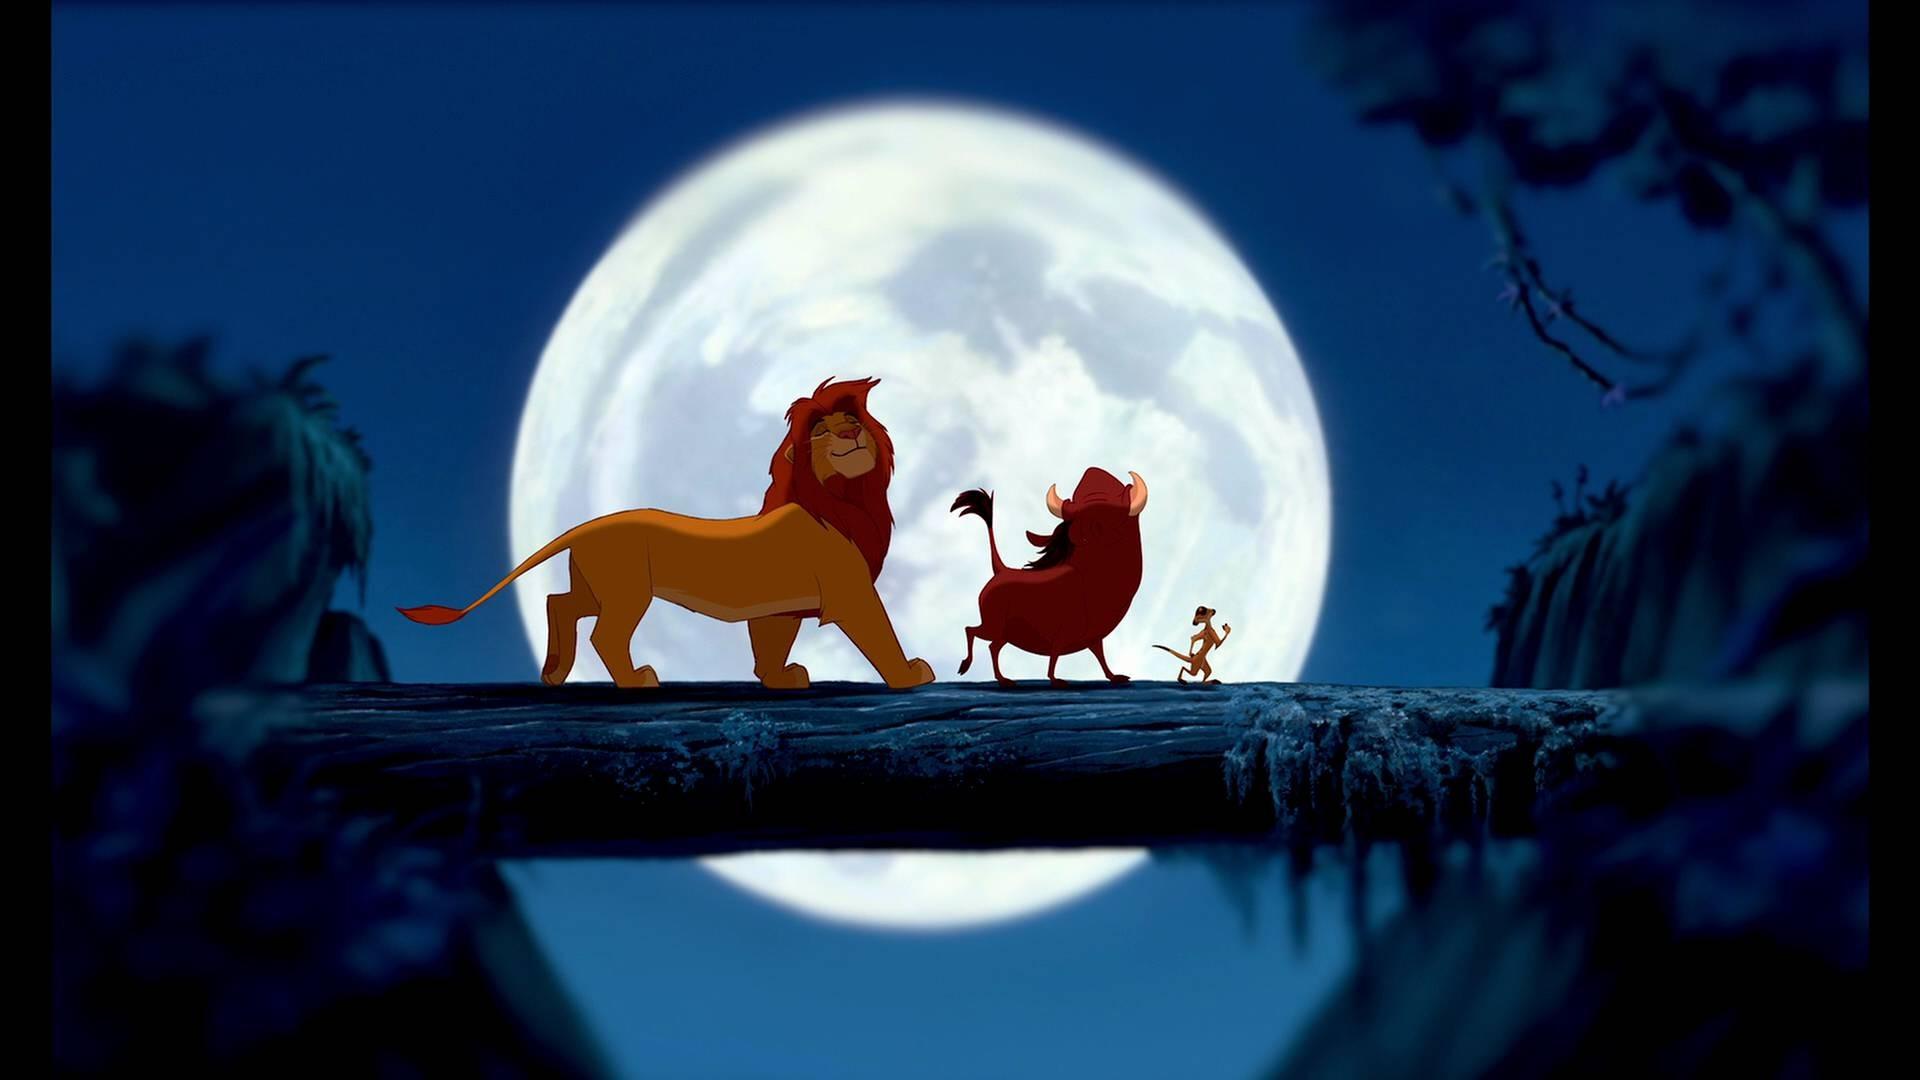 Digital Art Disney Company Minimalistic Movies The Lion King Vectors Wallpaper 1920x1080